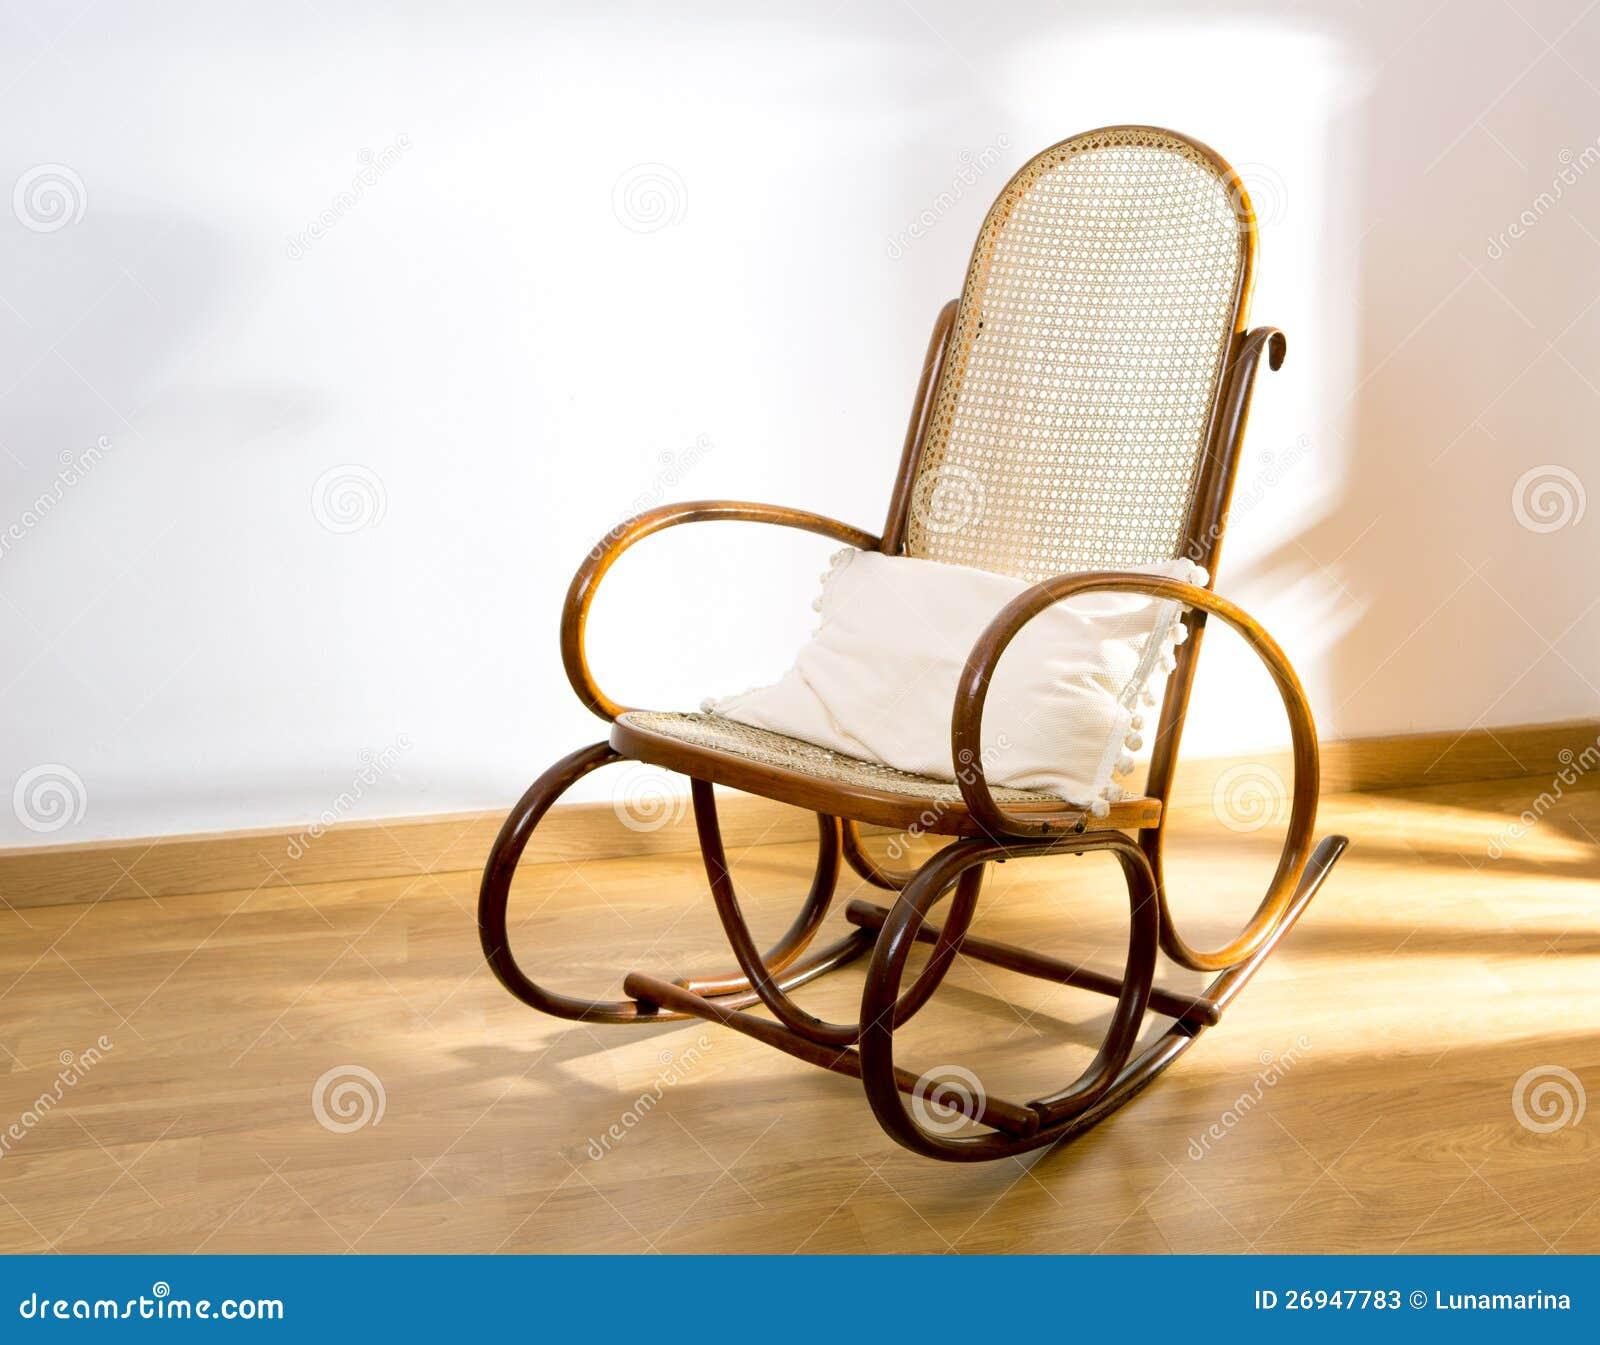 Golden Retro Rocker Wooden Swing Chair Stock Photos